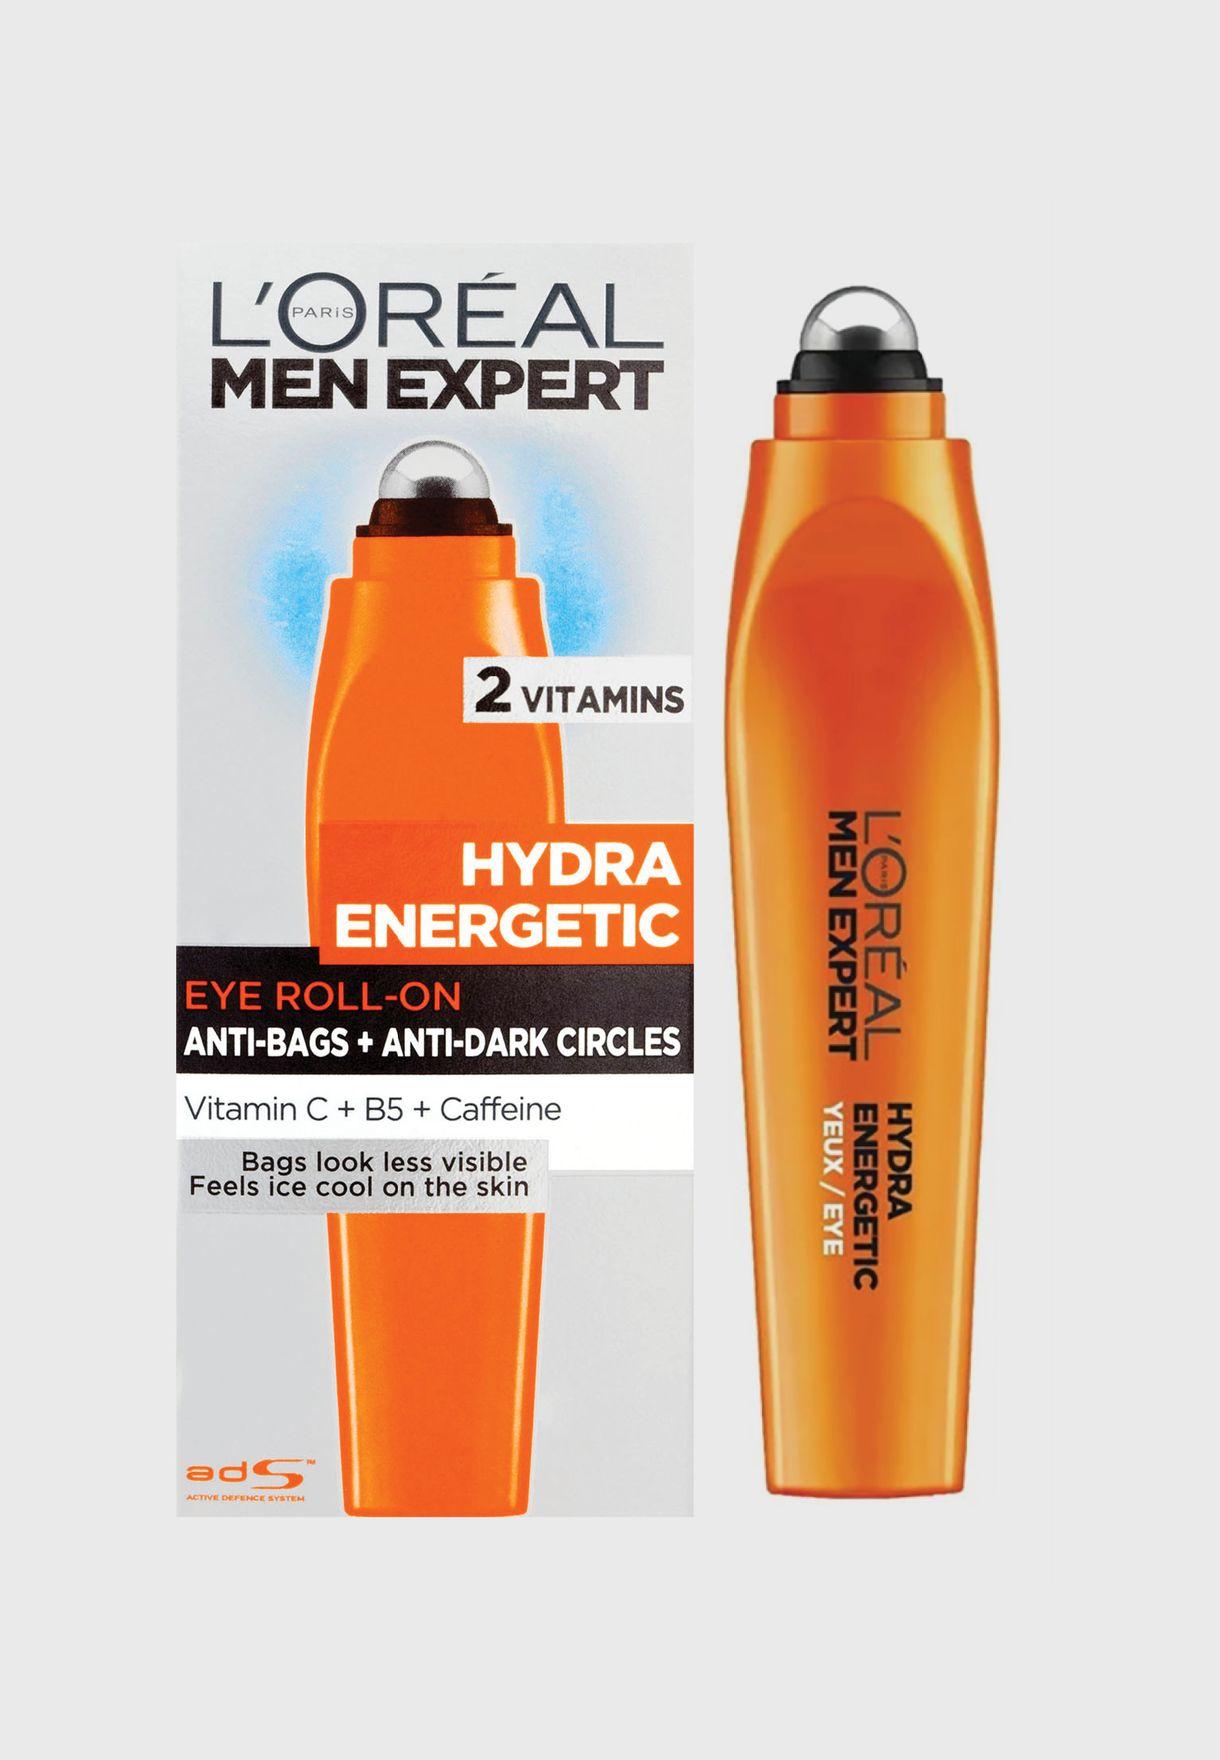 Hydra Energetic Ice Cool Eye Roll-On